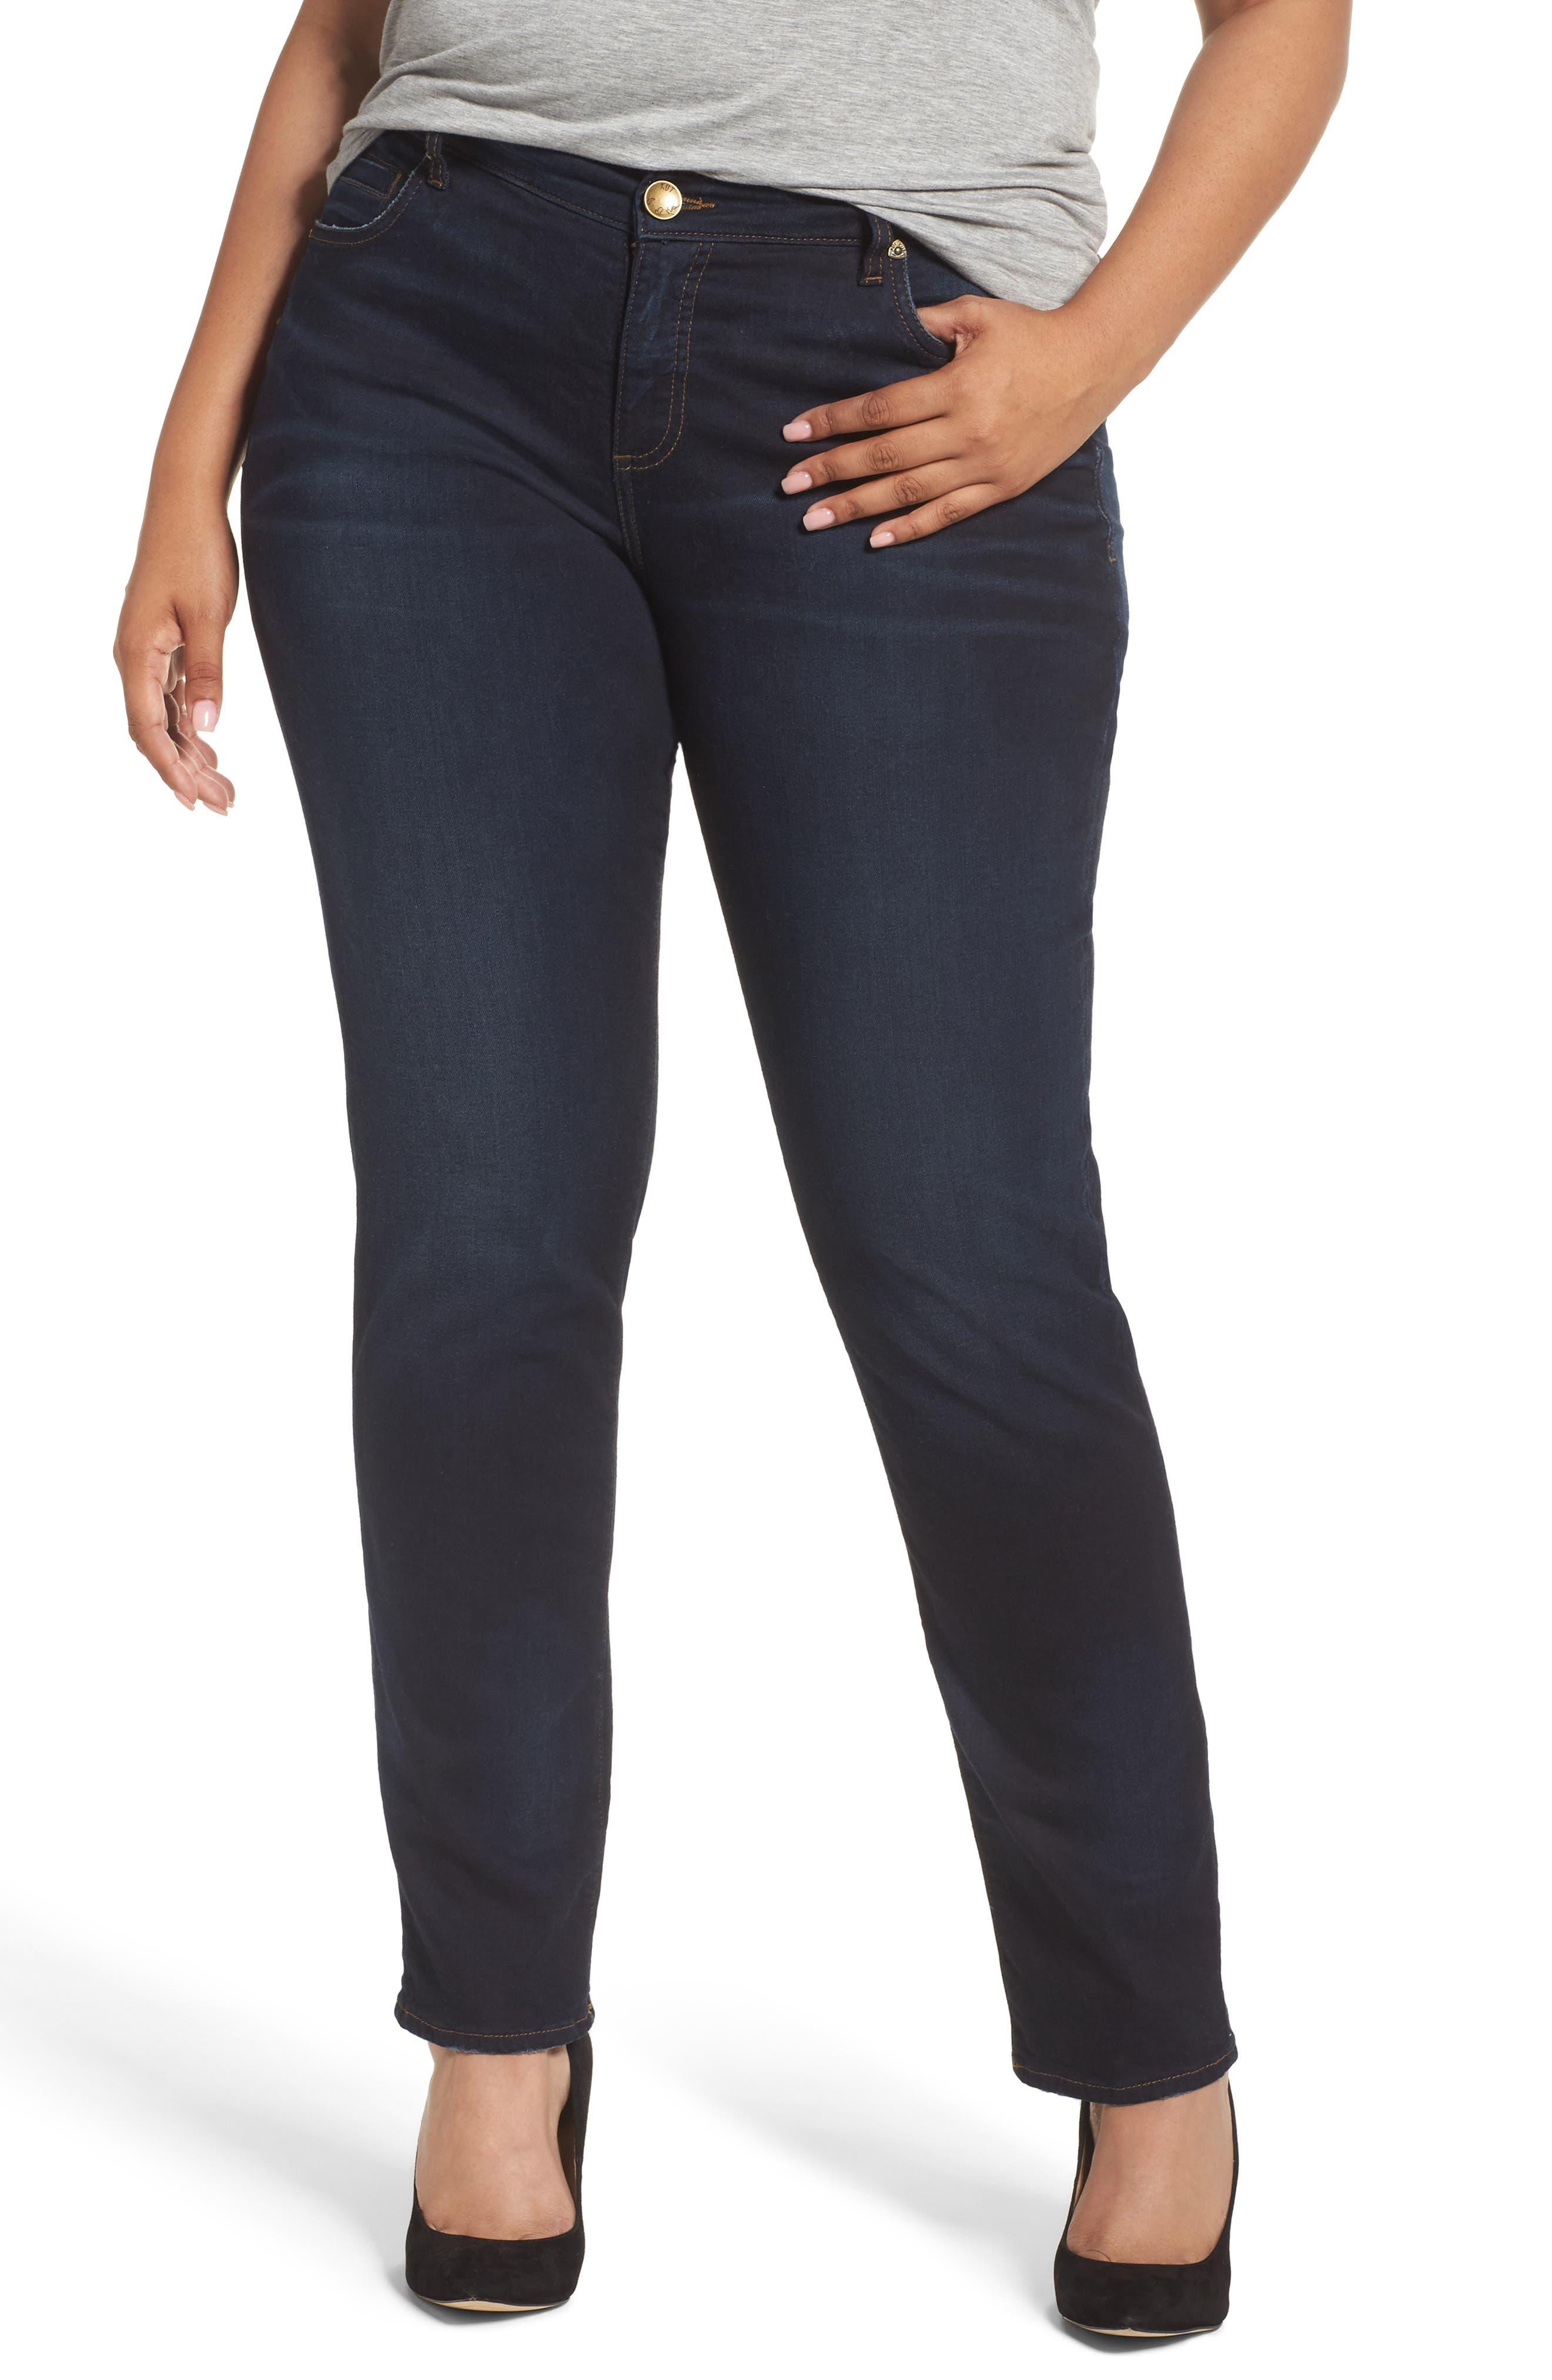 Diana Stretch Skinny Jeans,                         Main,                         color,